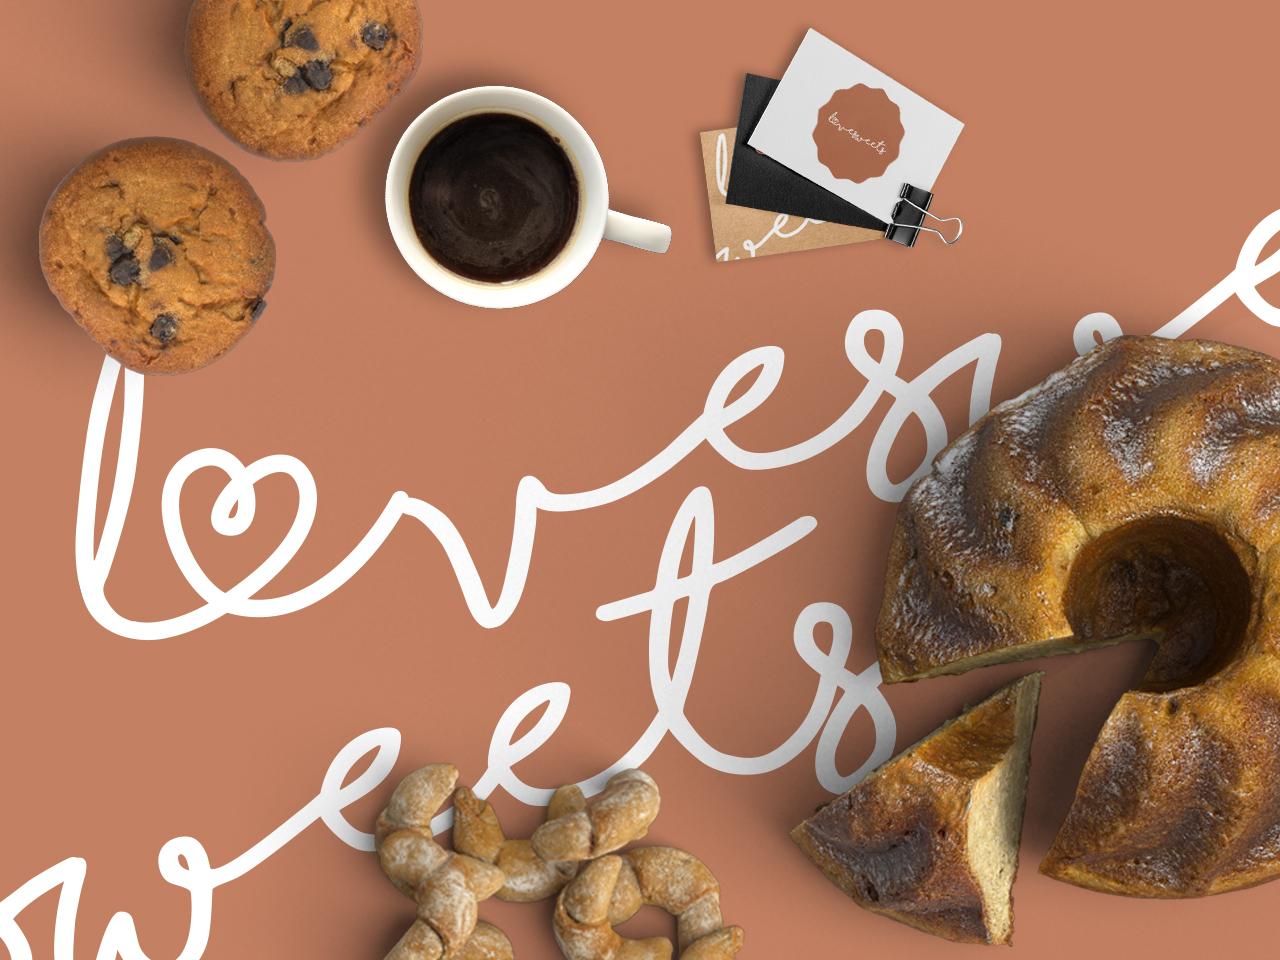 Concept for Lovesweets bakery bakery logo mockup design typography branding design